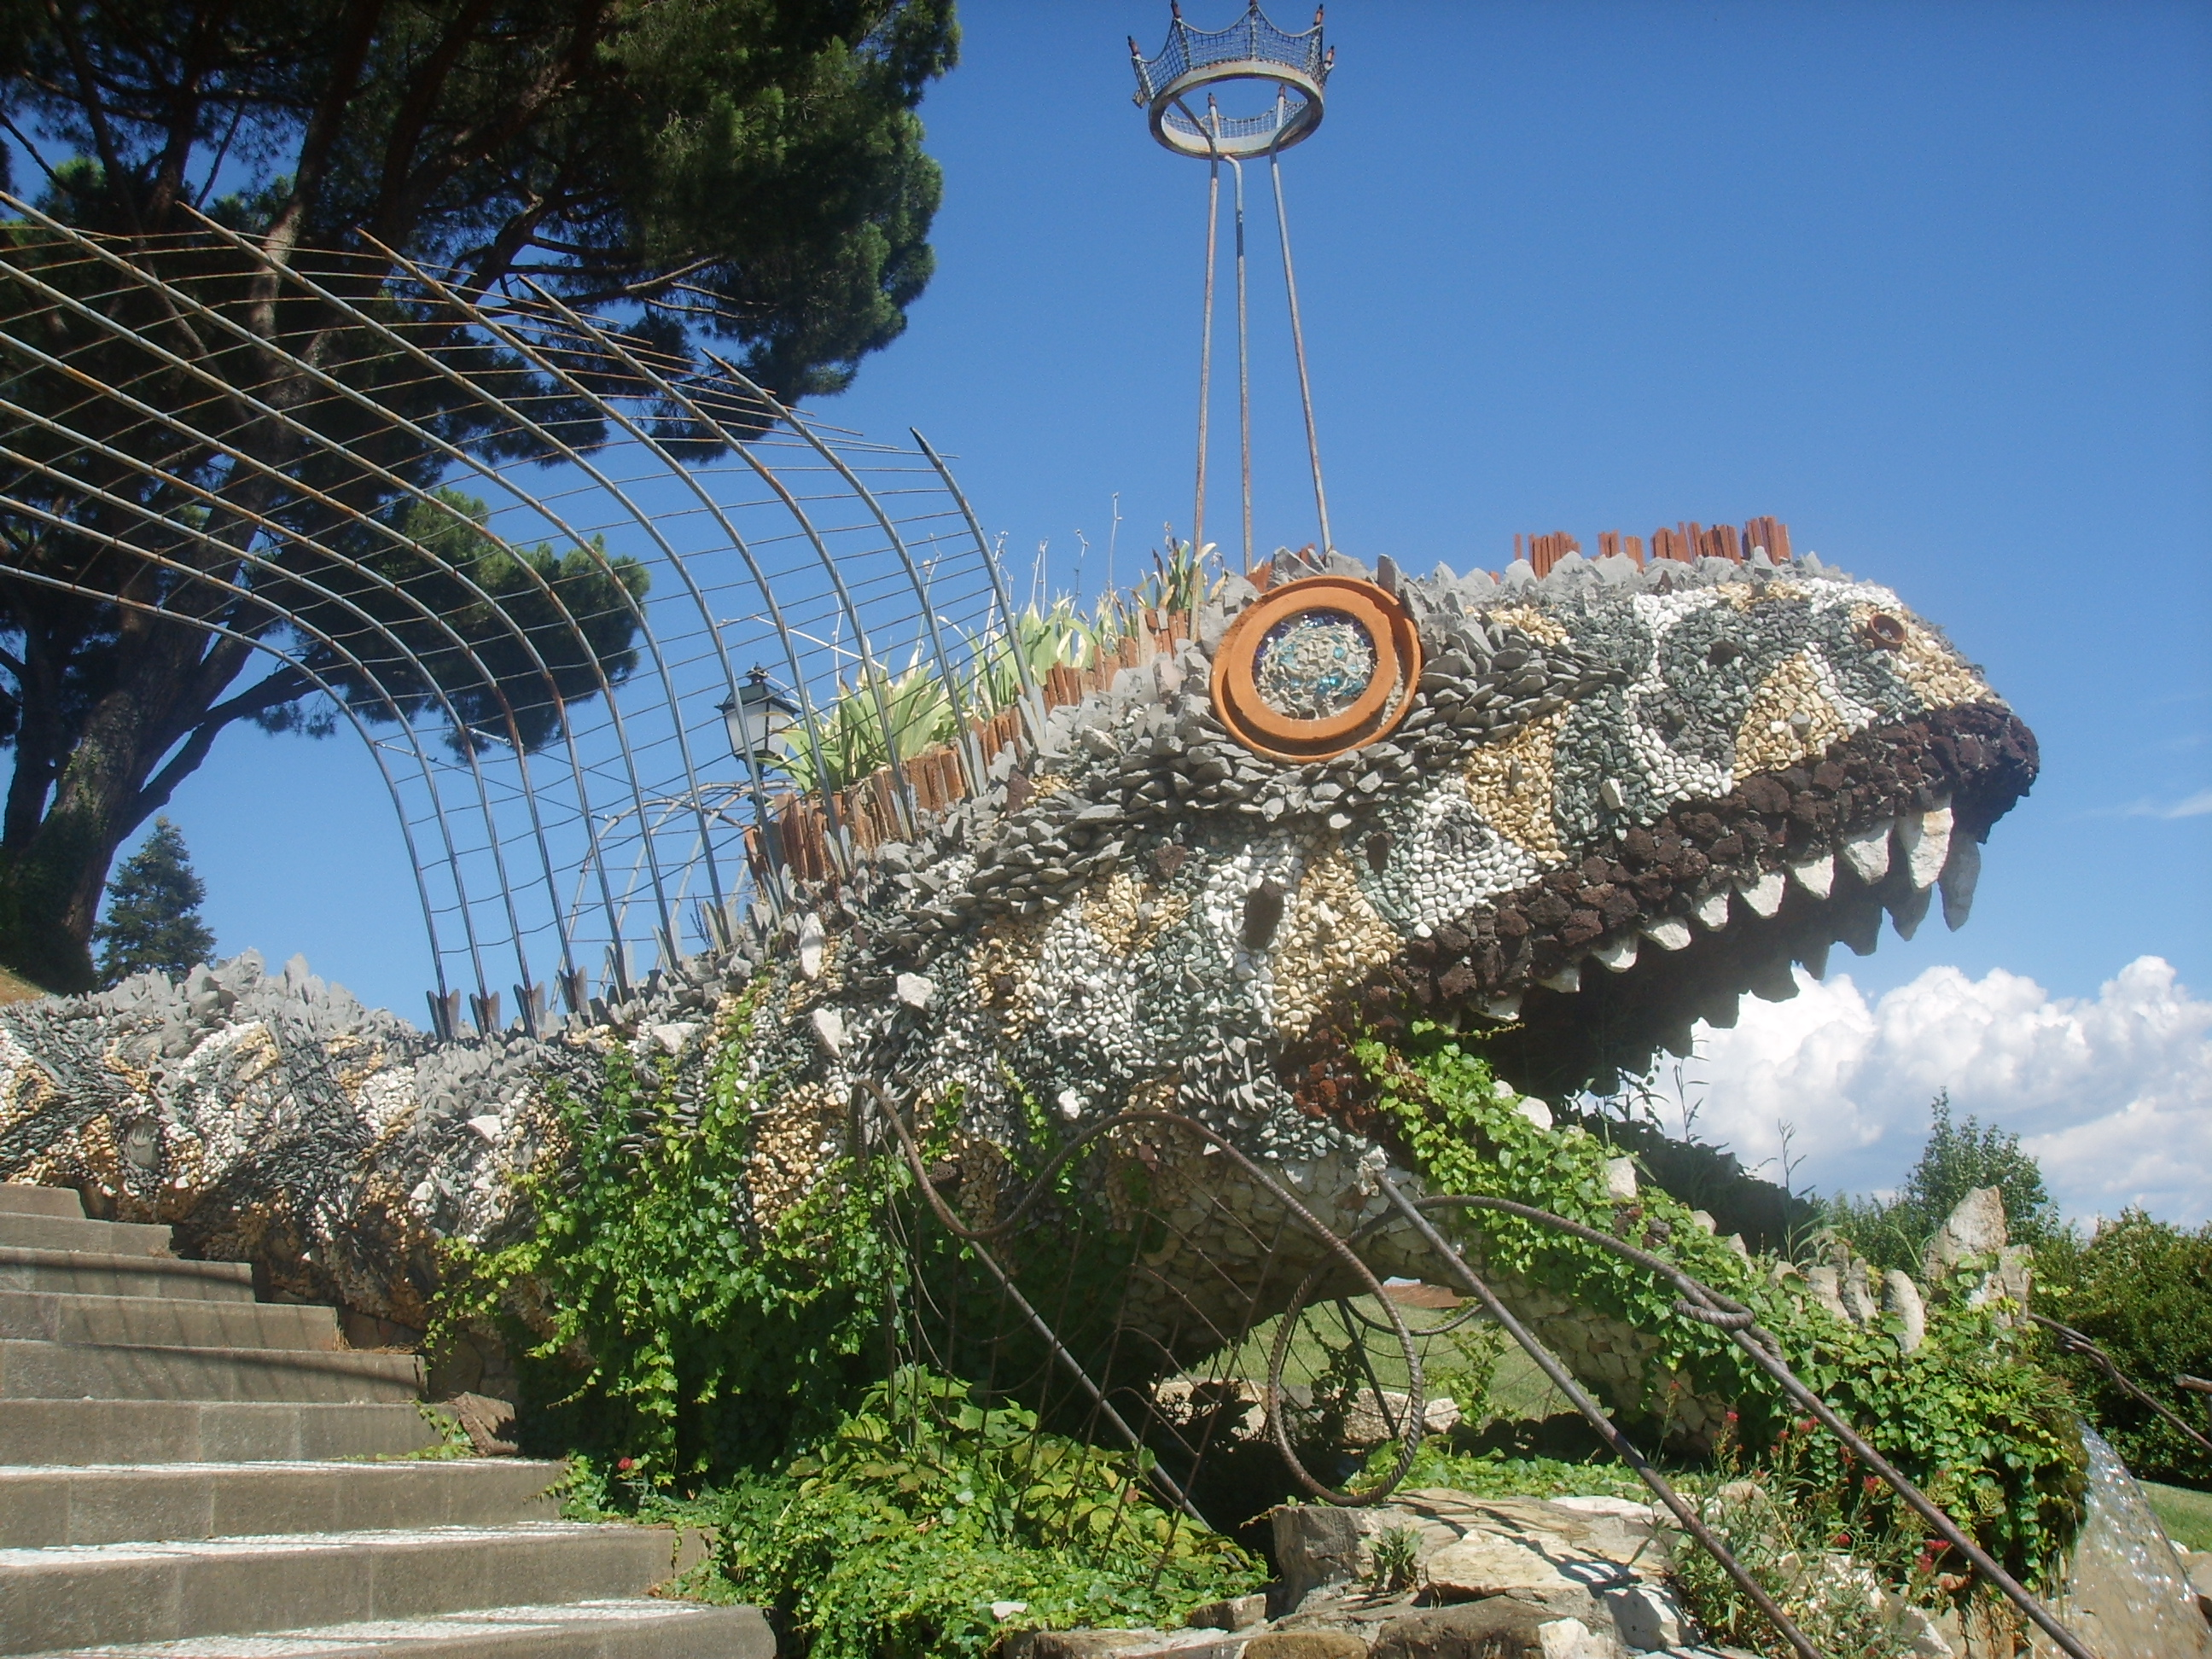 File giardino dell 39 orticultura 13 jpg wikimedia commons for Giardino firenze